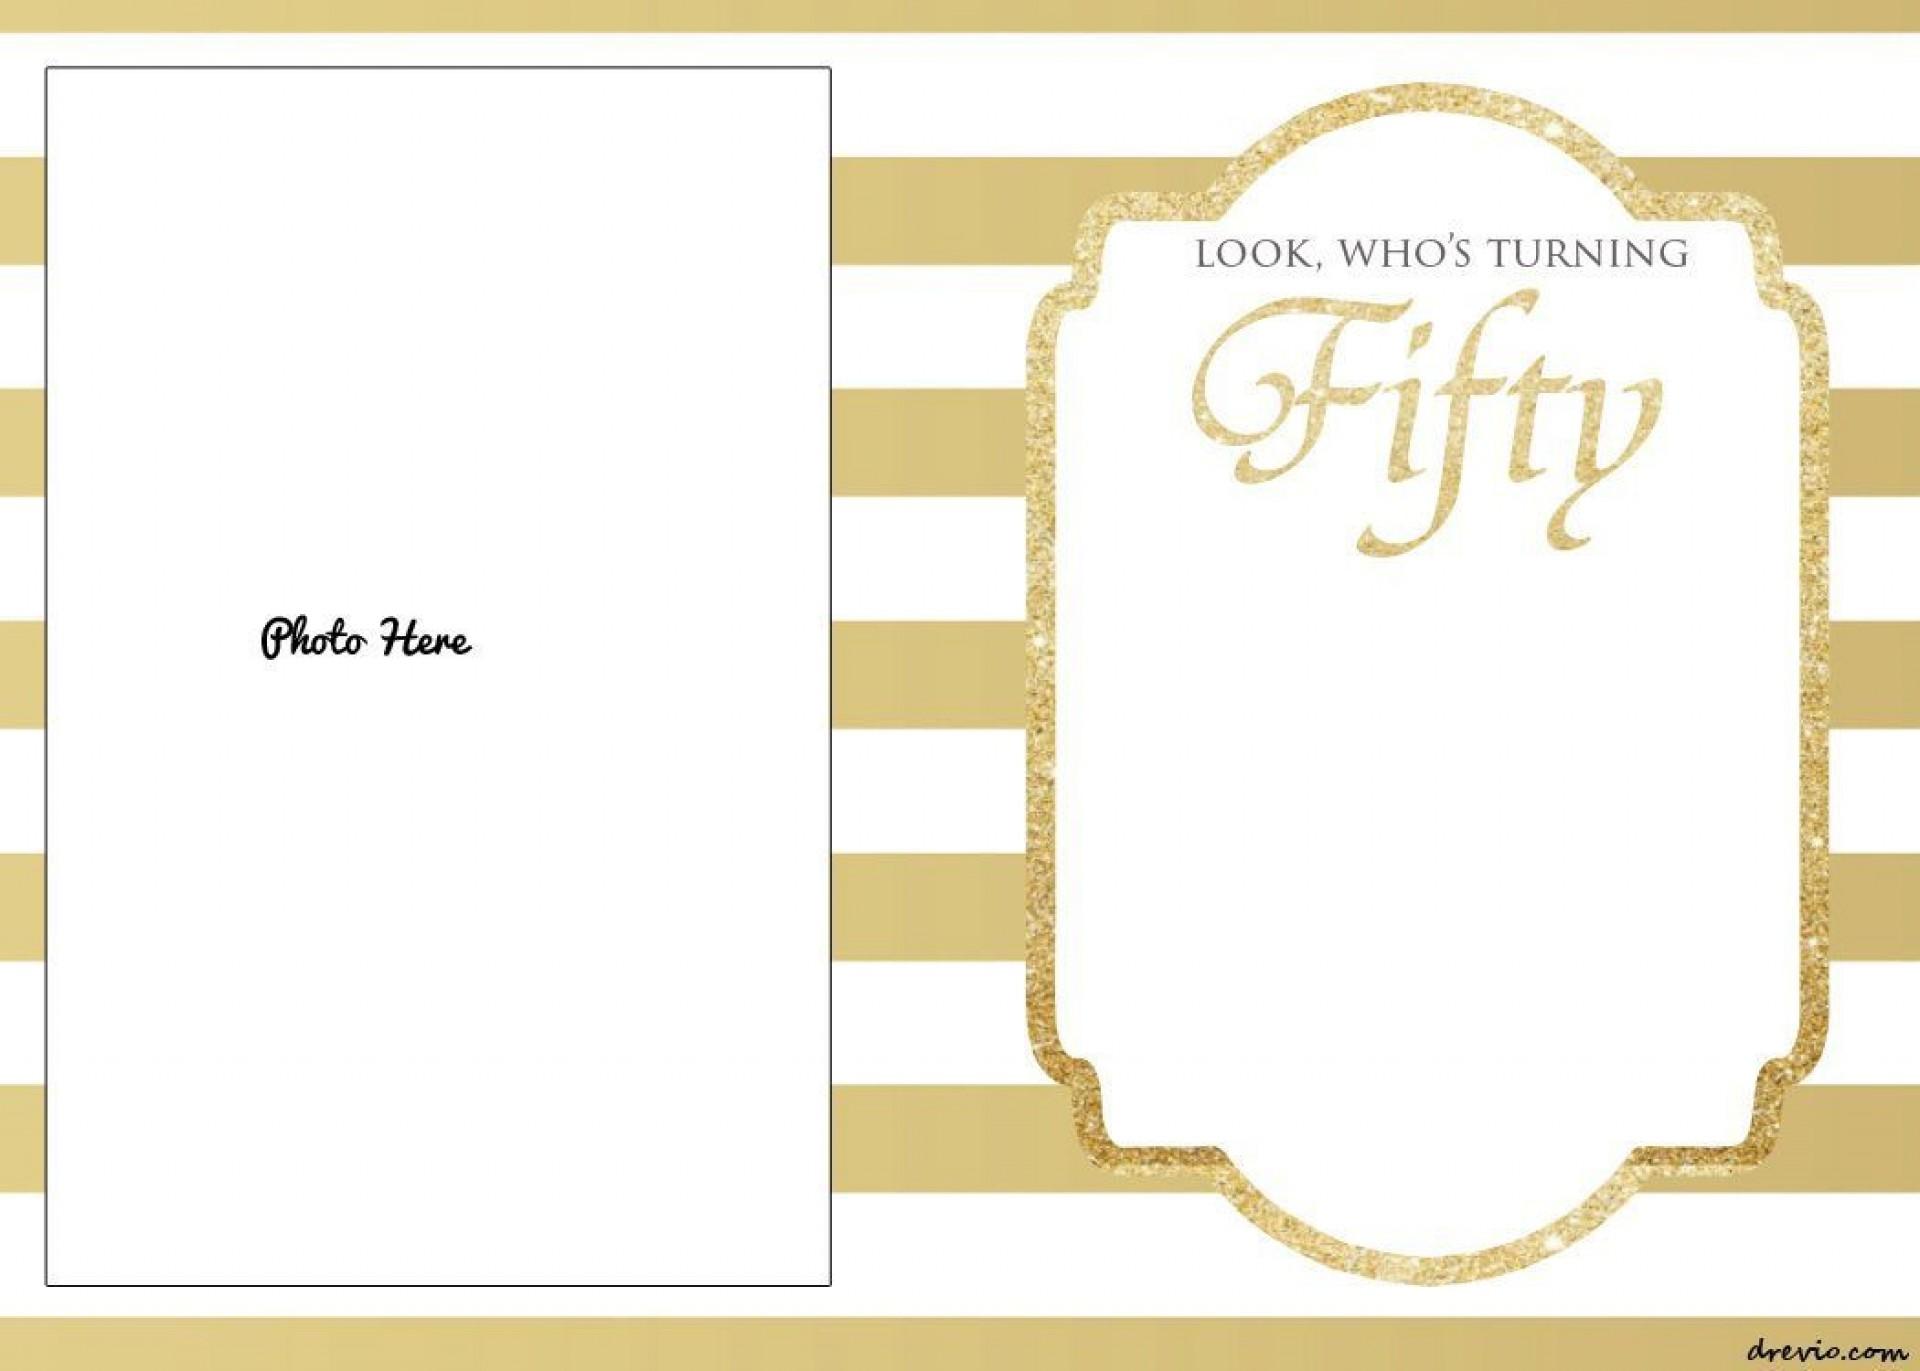 009 Phenomenal 50th Wedding Anniversary Invitation Template Free Download High Def  Golden1920